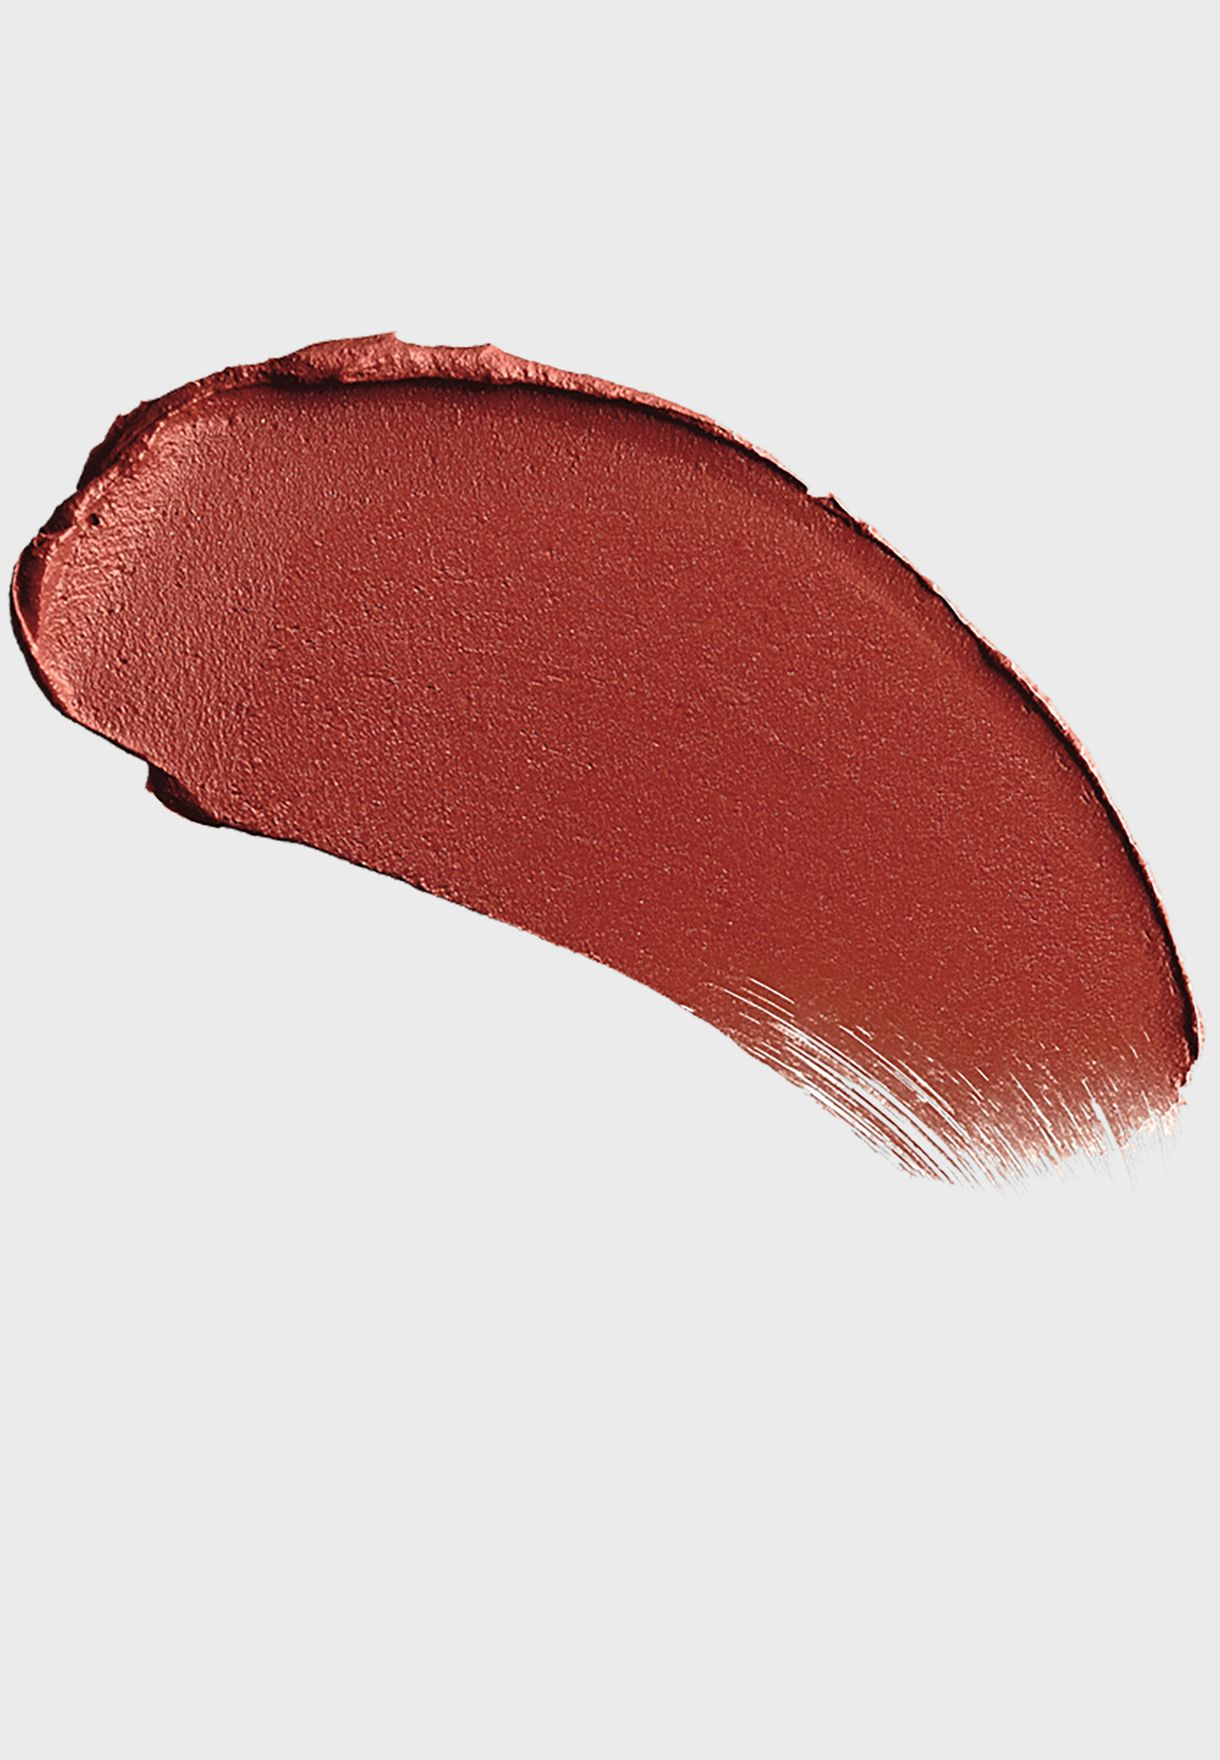 Matte Revolution Lipstick - Bond Girl